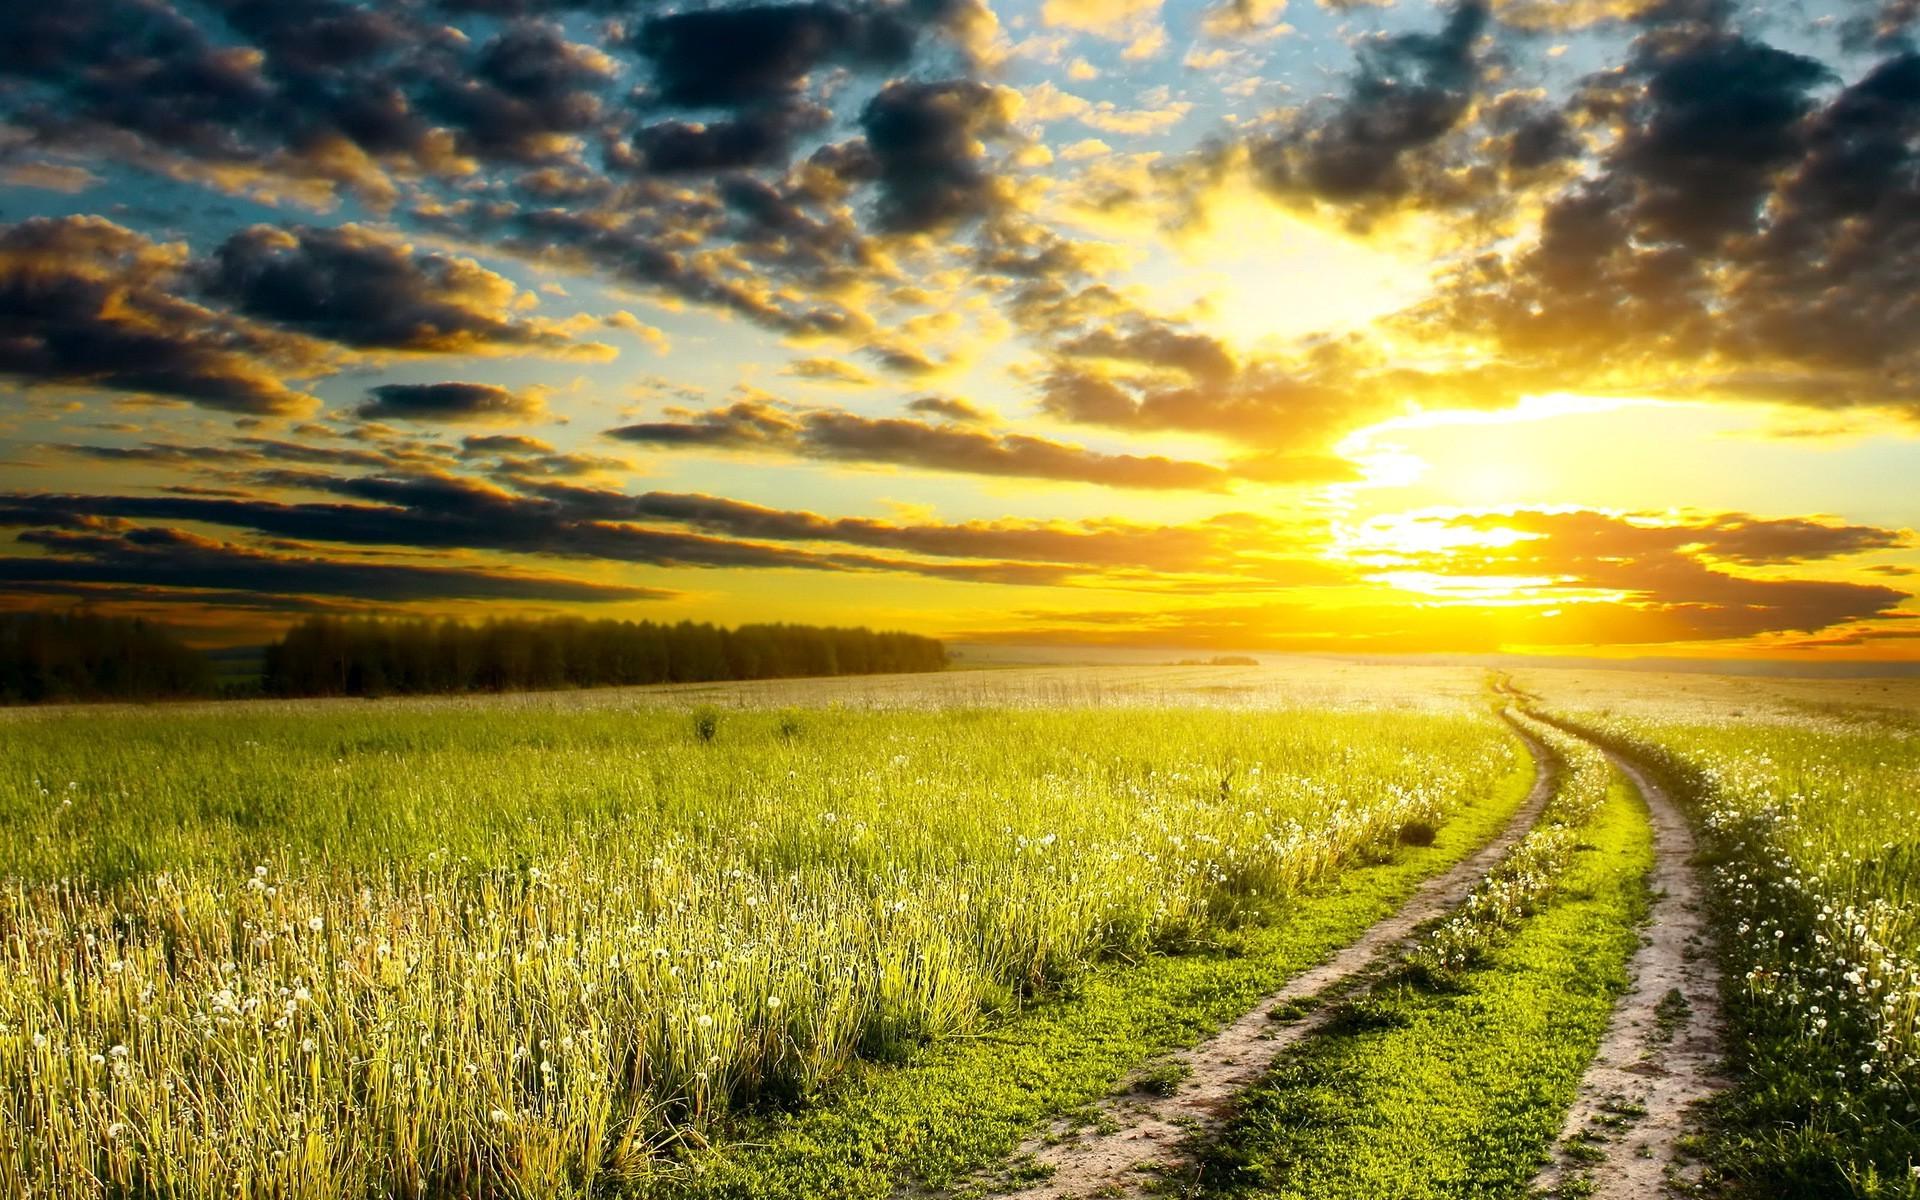 1920x1200 Px Clouds Dirt Road Grass Landscape Nature Path Sunset